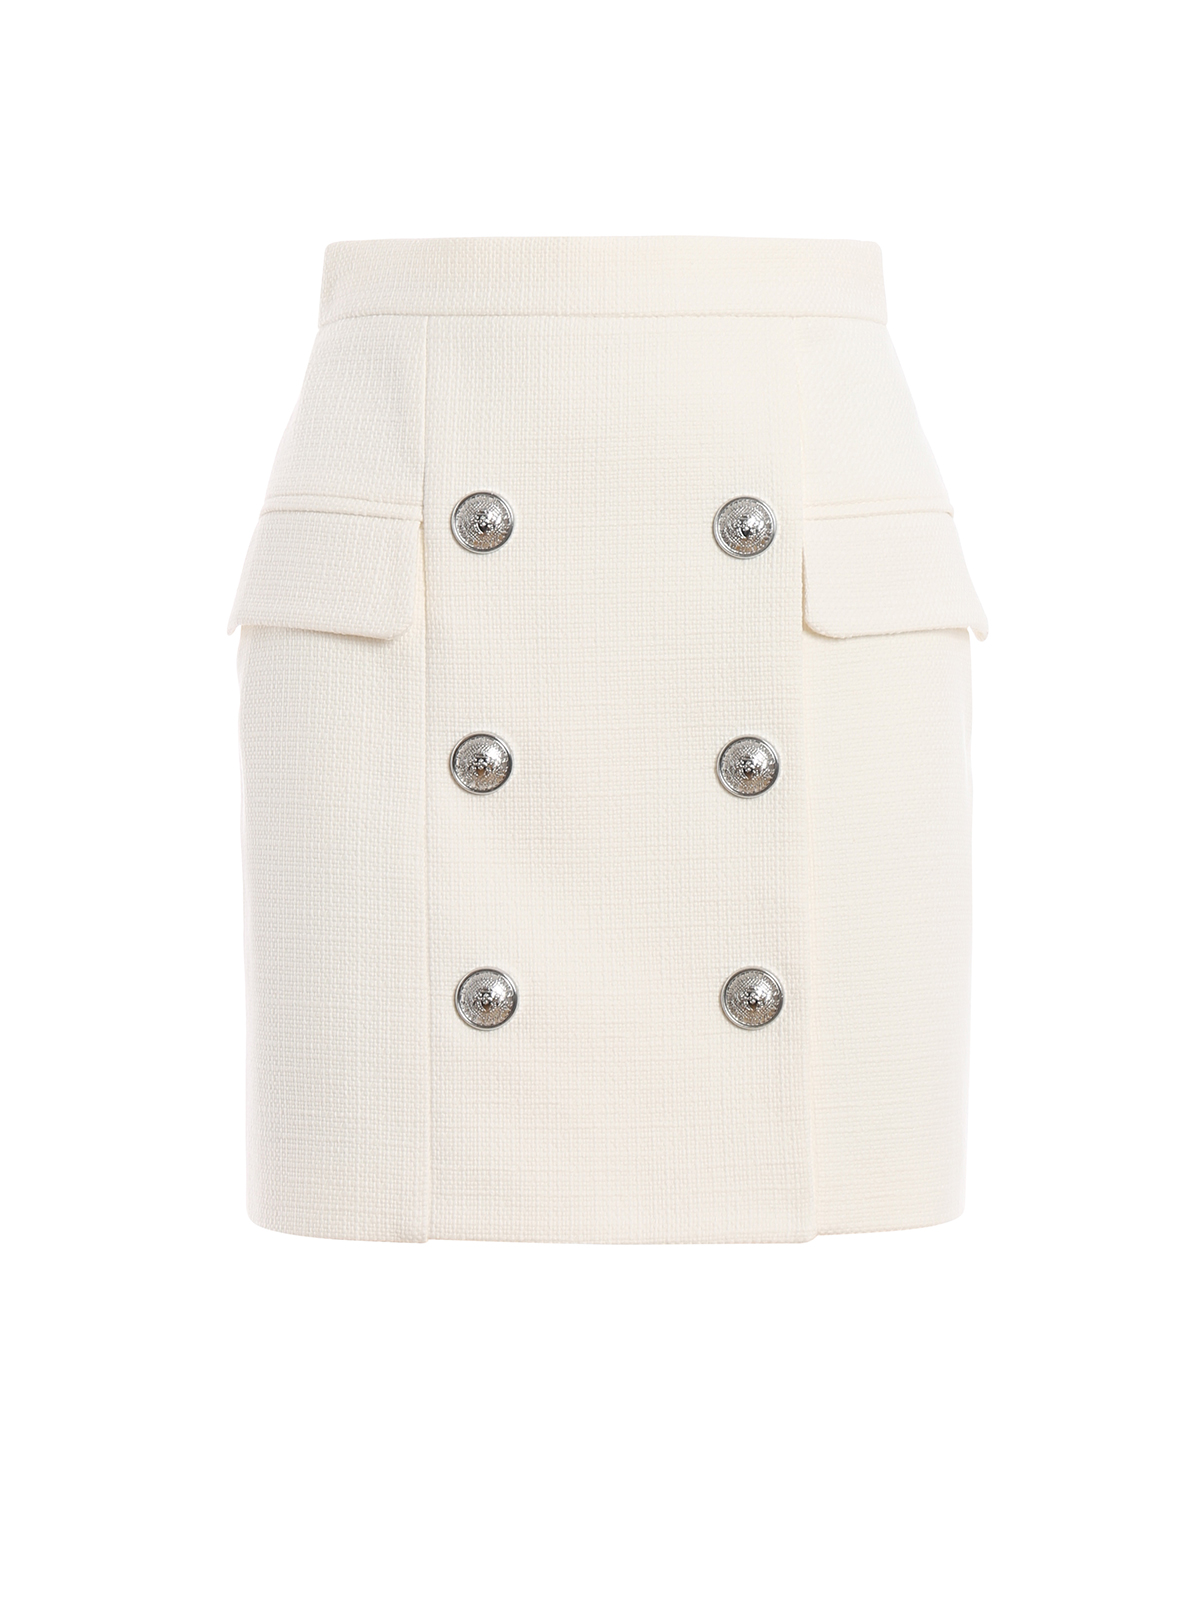 cc9d8698a5 White natte cotton high waist mini skirt - BALMAIN - Paolo Fiorillo